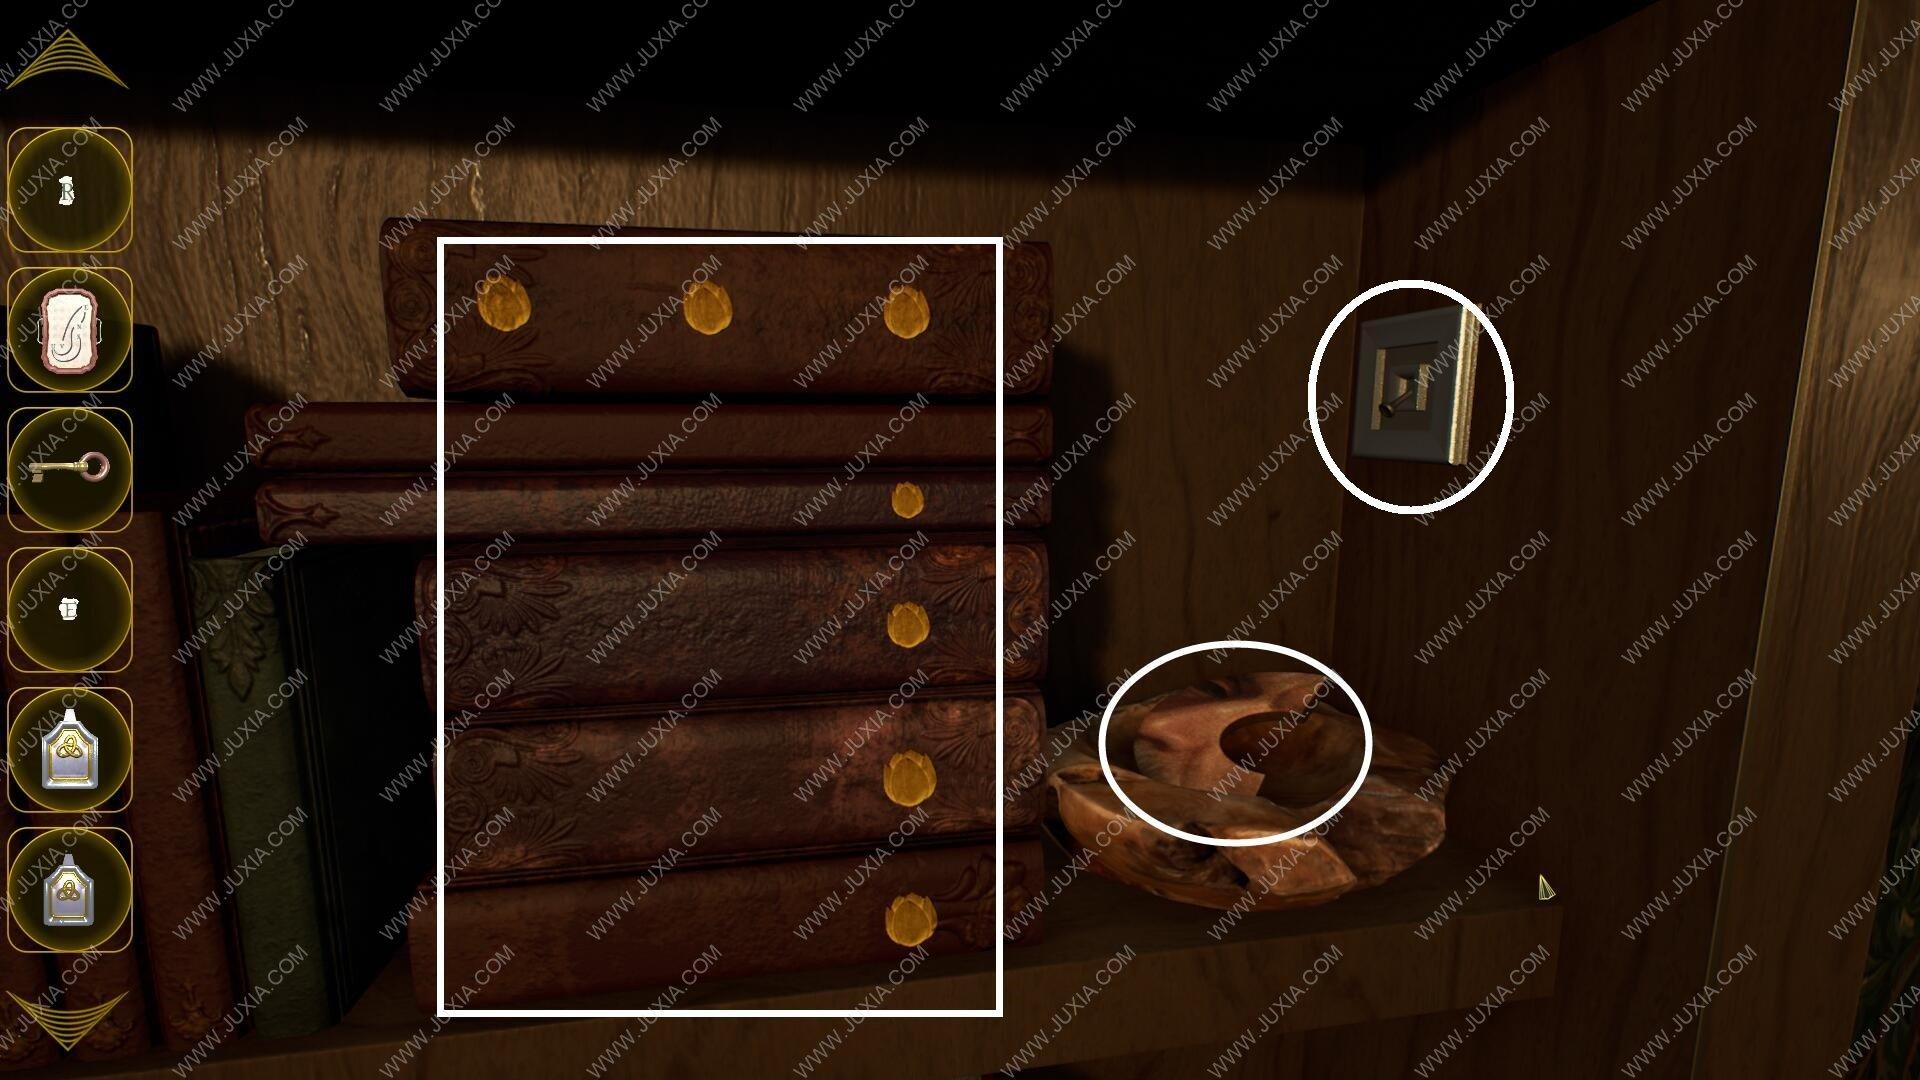 Acuriousheritage攻略书房上 GordianRooms盒子如何找到